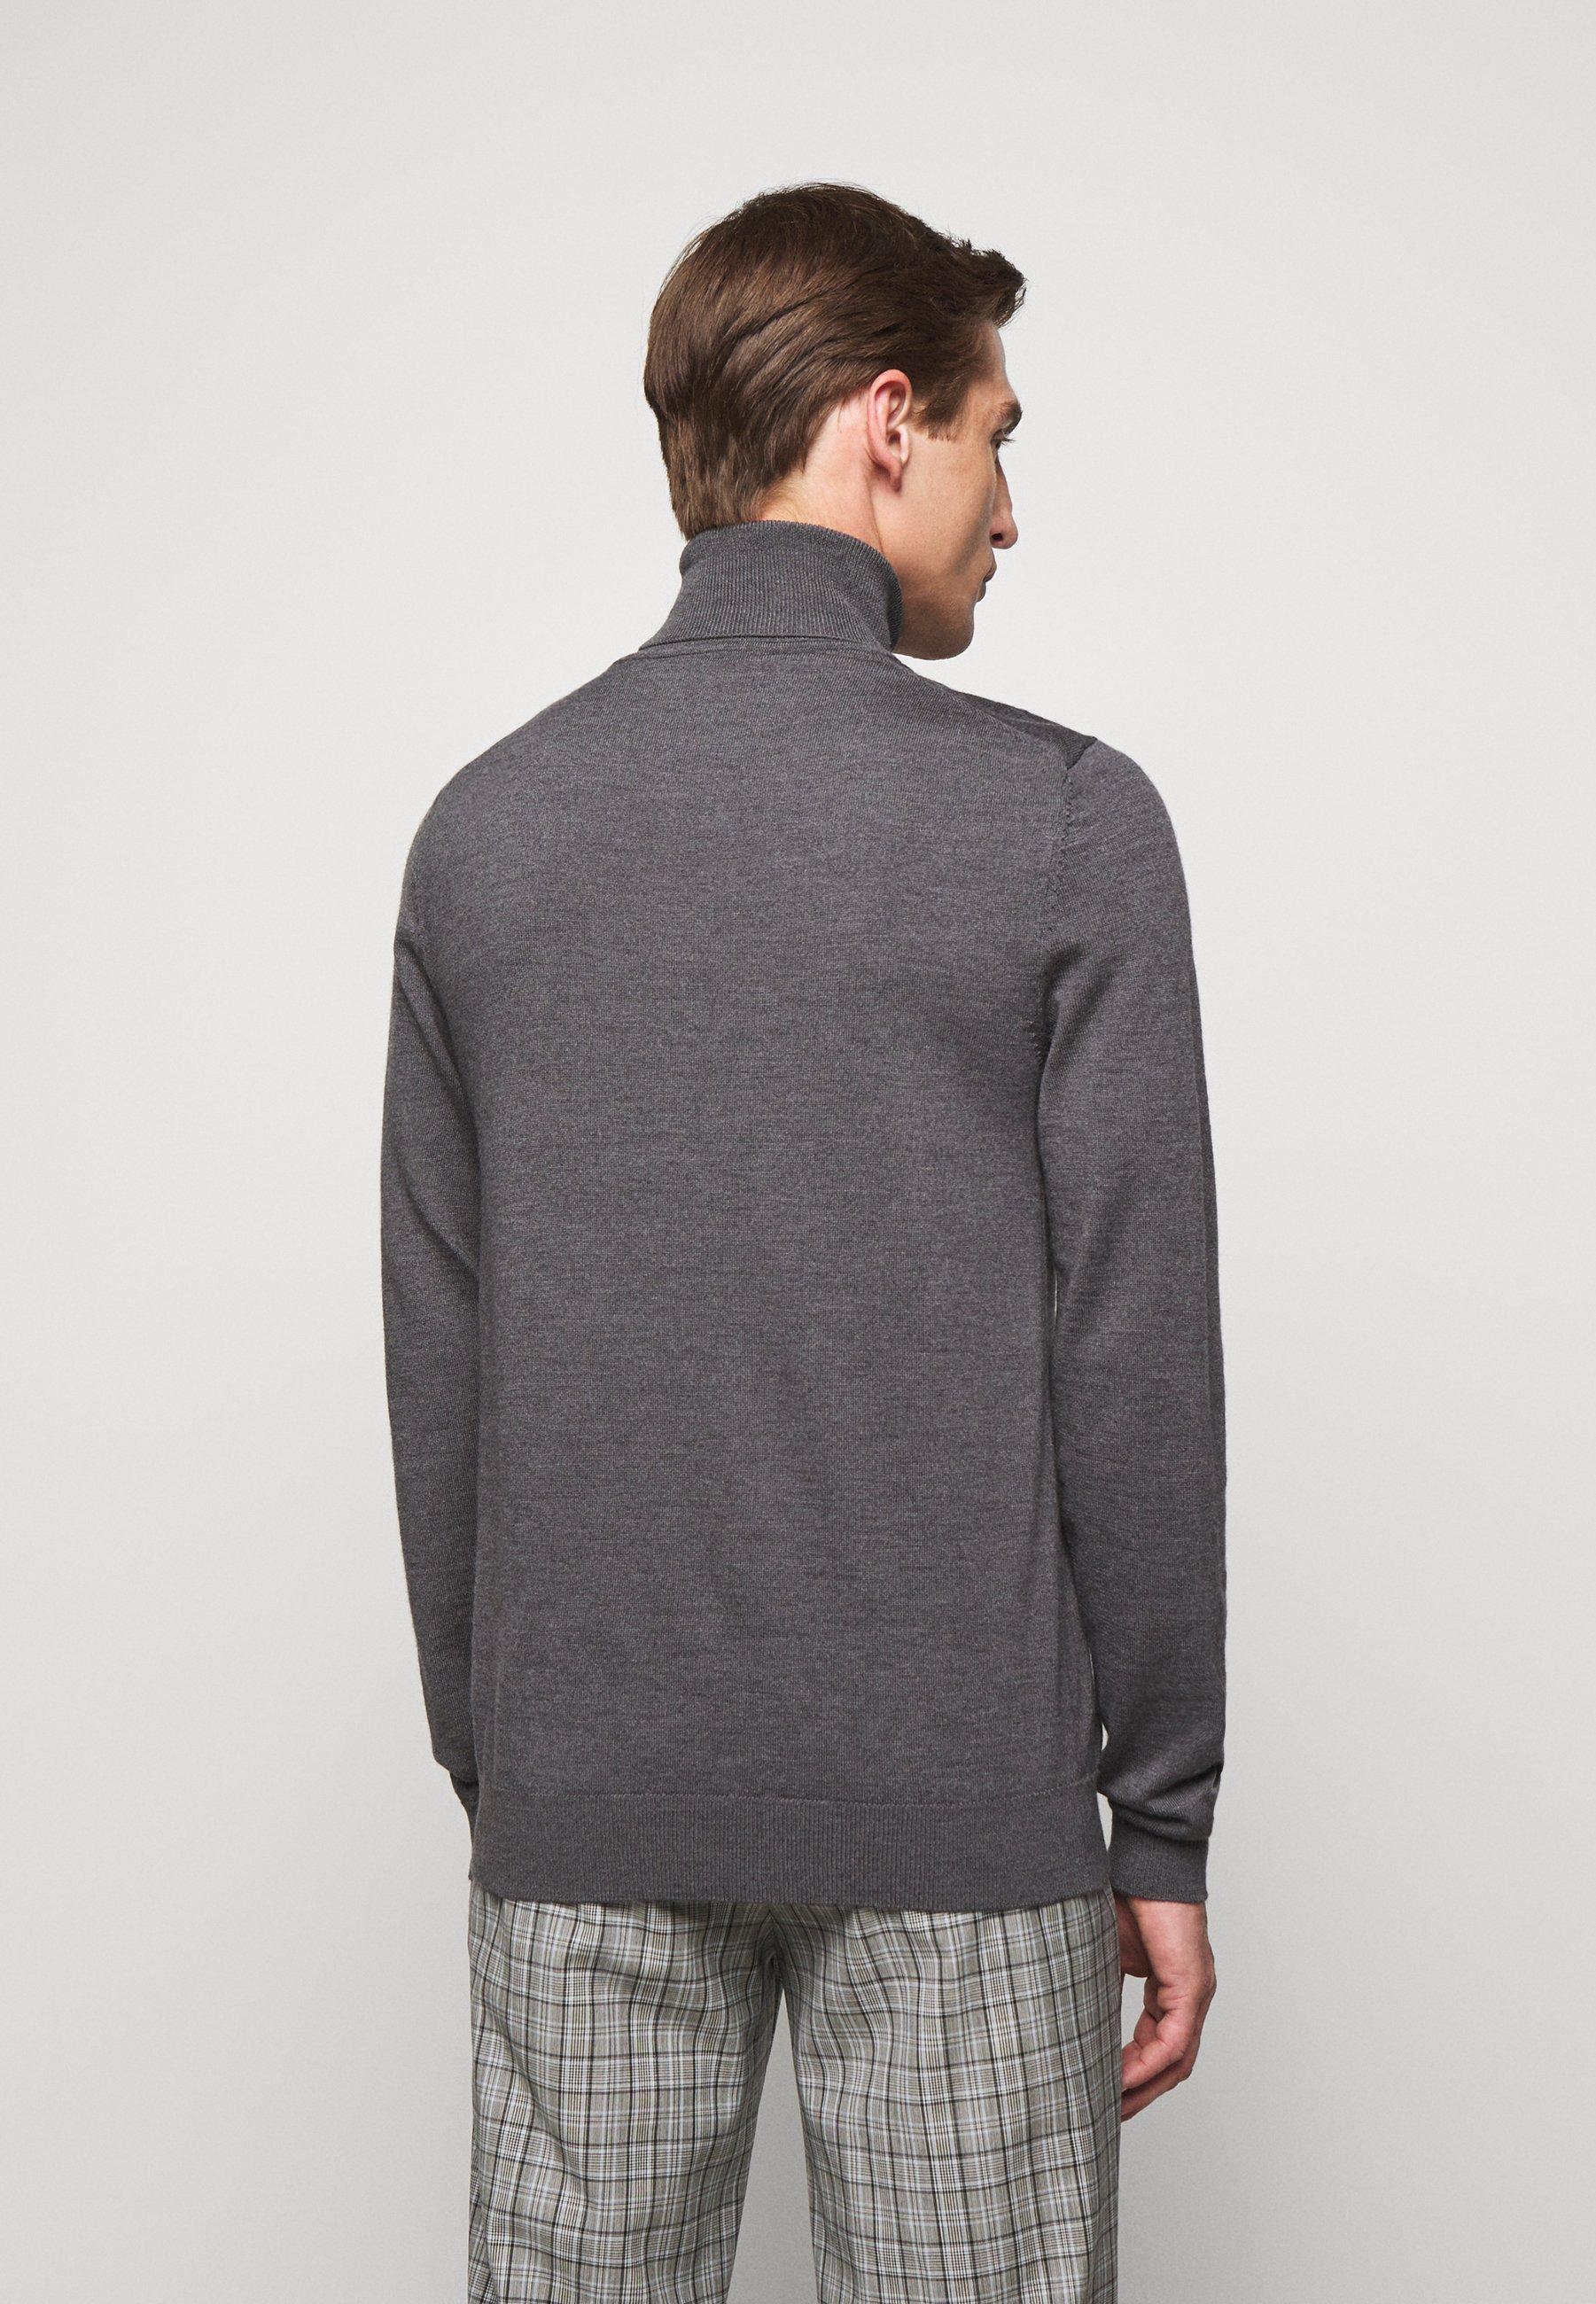 Pepe Jeans PHILIP - Stickad tröja - infinity/mörkgrå - Herr Vinterkläder impwK